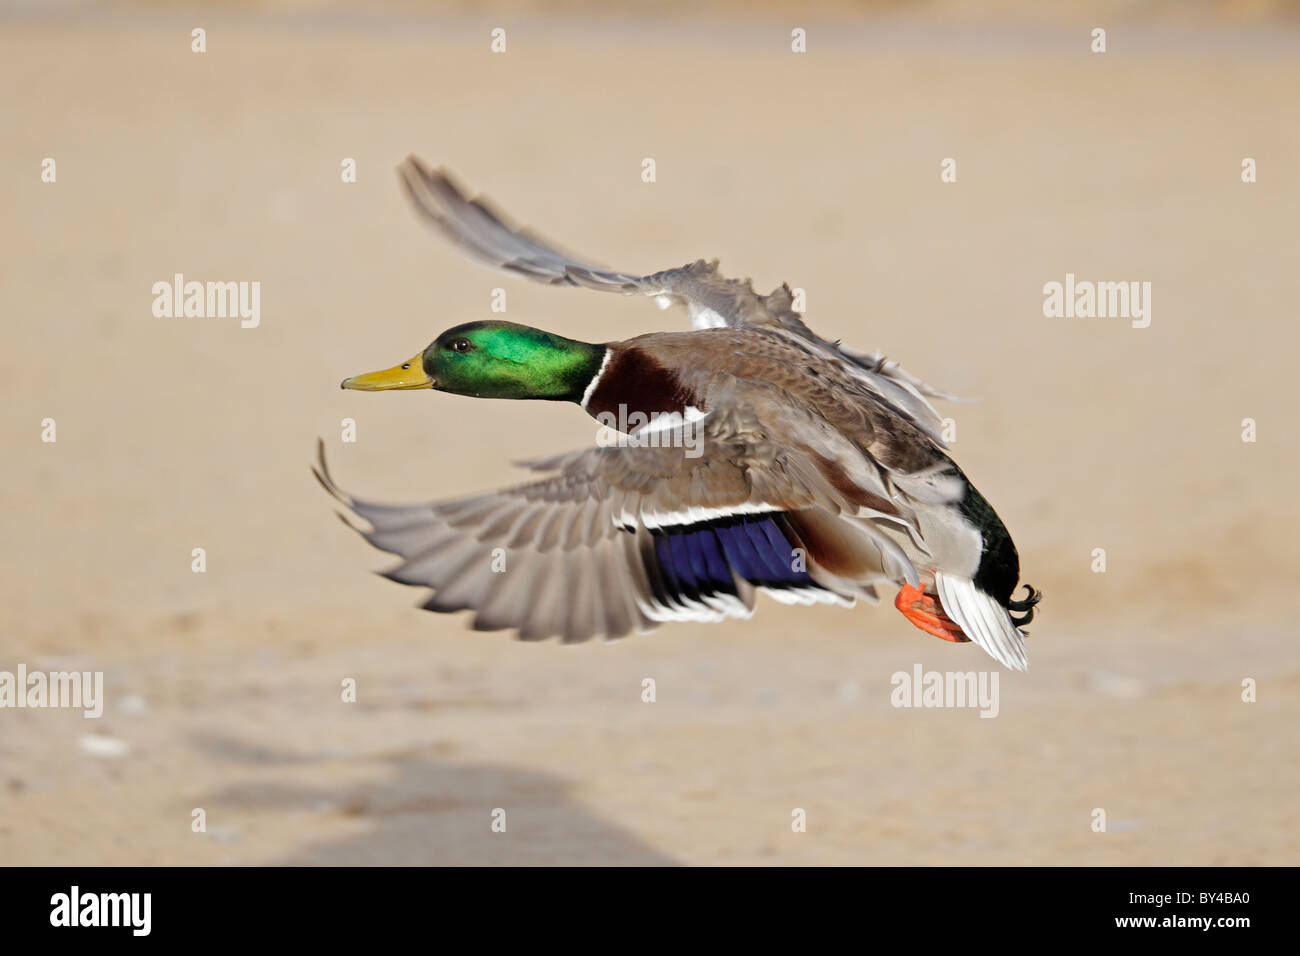 Drake Mallard in flight - Stock Image